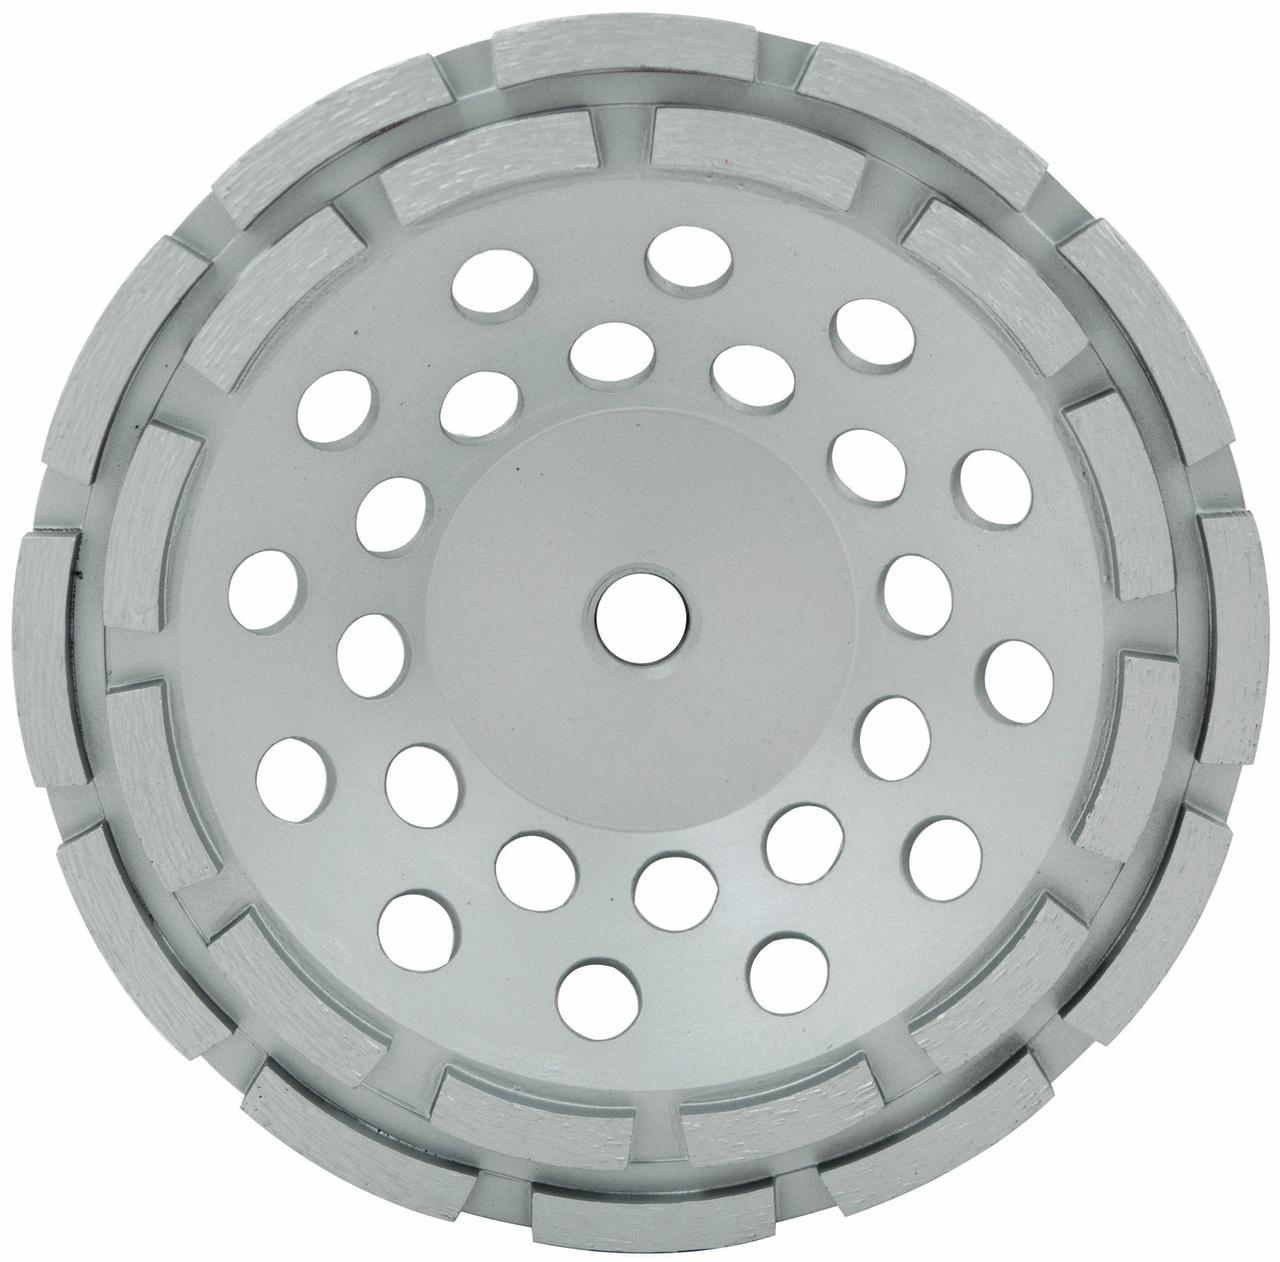 "7"" Spp Series Double Row Cup Wheel, Wet/Dry, 7/8""-5/8"""